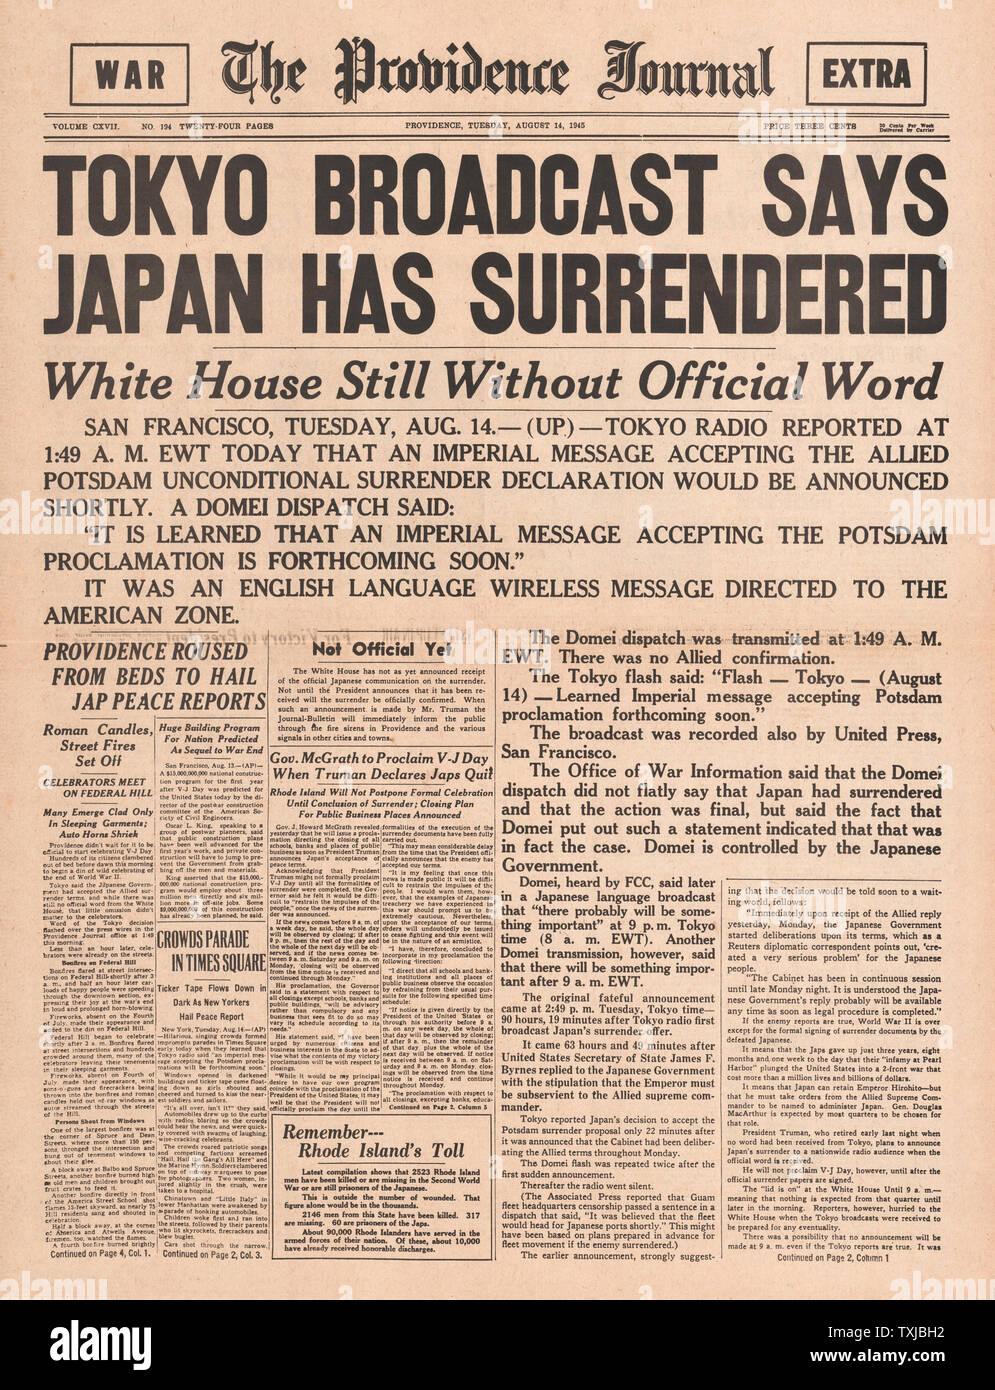 Harry Truman Newspaper Stock Photos & Harry Truman Newspaper